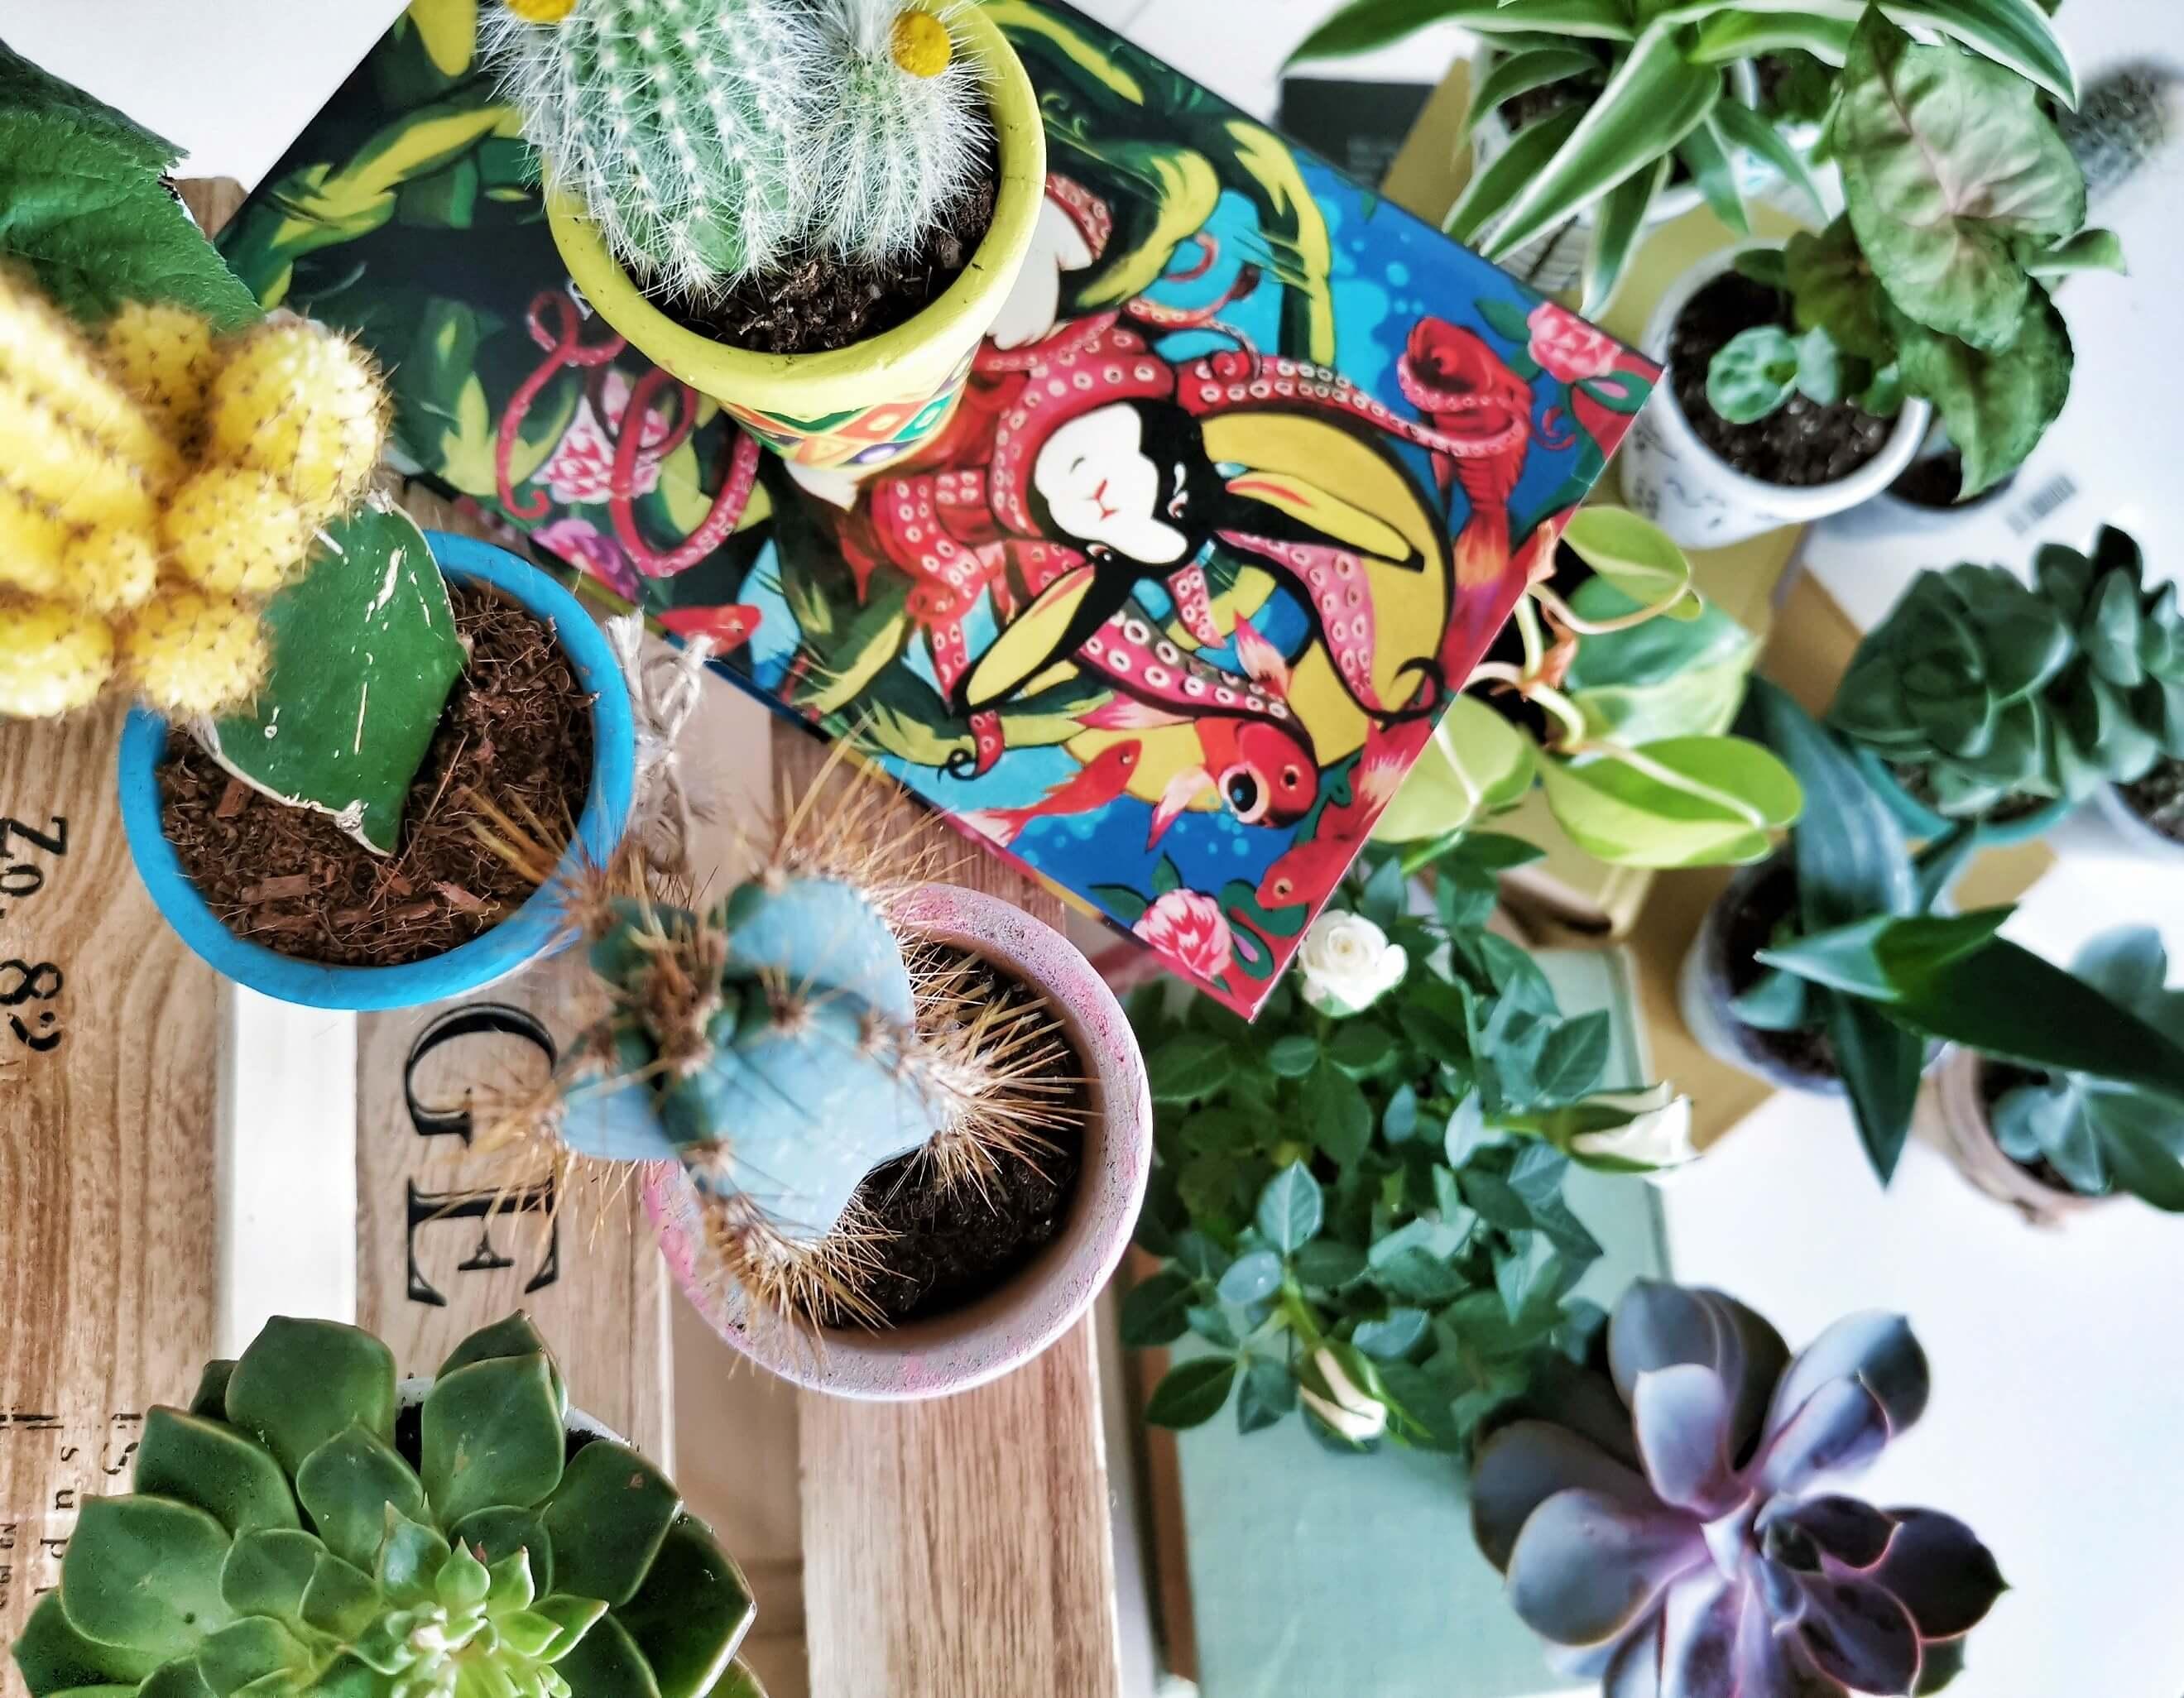 IMG 20190612 131831 01 resized 20190612 062906038 - Kreatives Recycling: Blumentöpfe in 5 verschiedenen Stilen